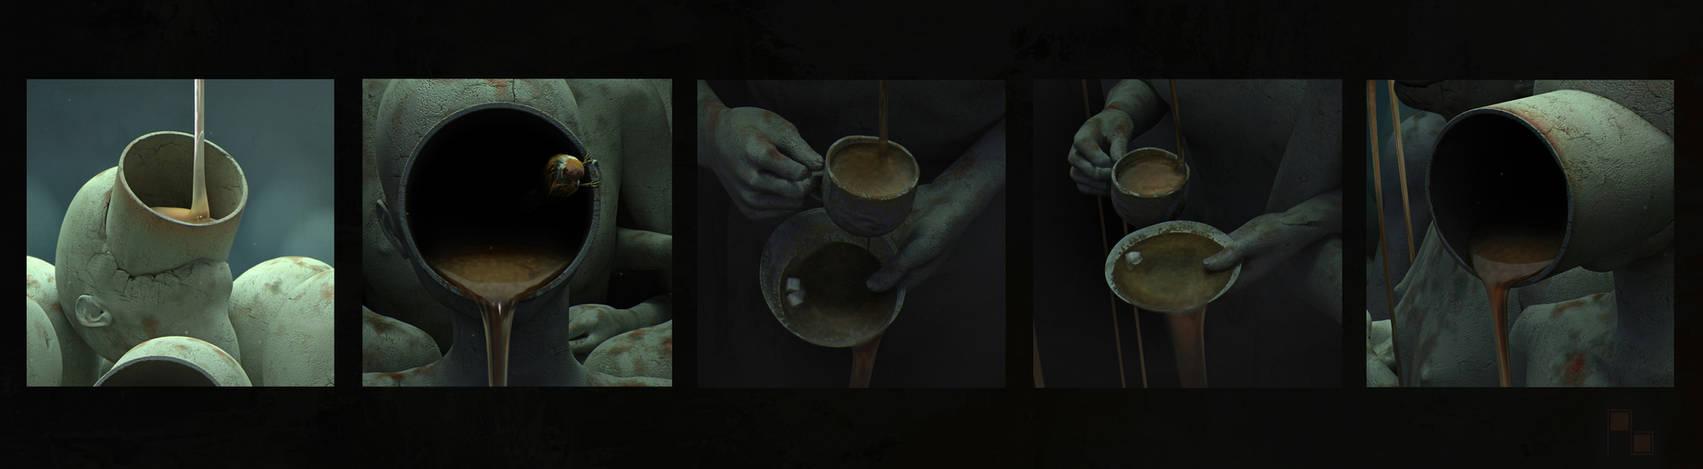 coffee-break_(Chained freedom)_fragments